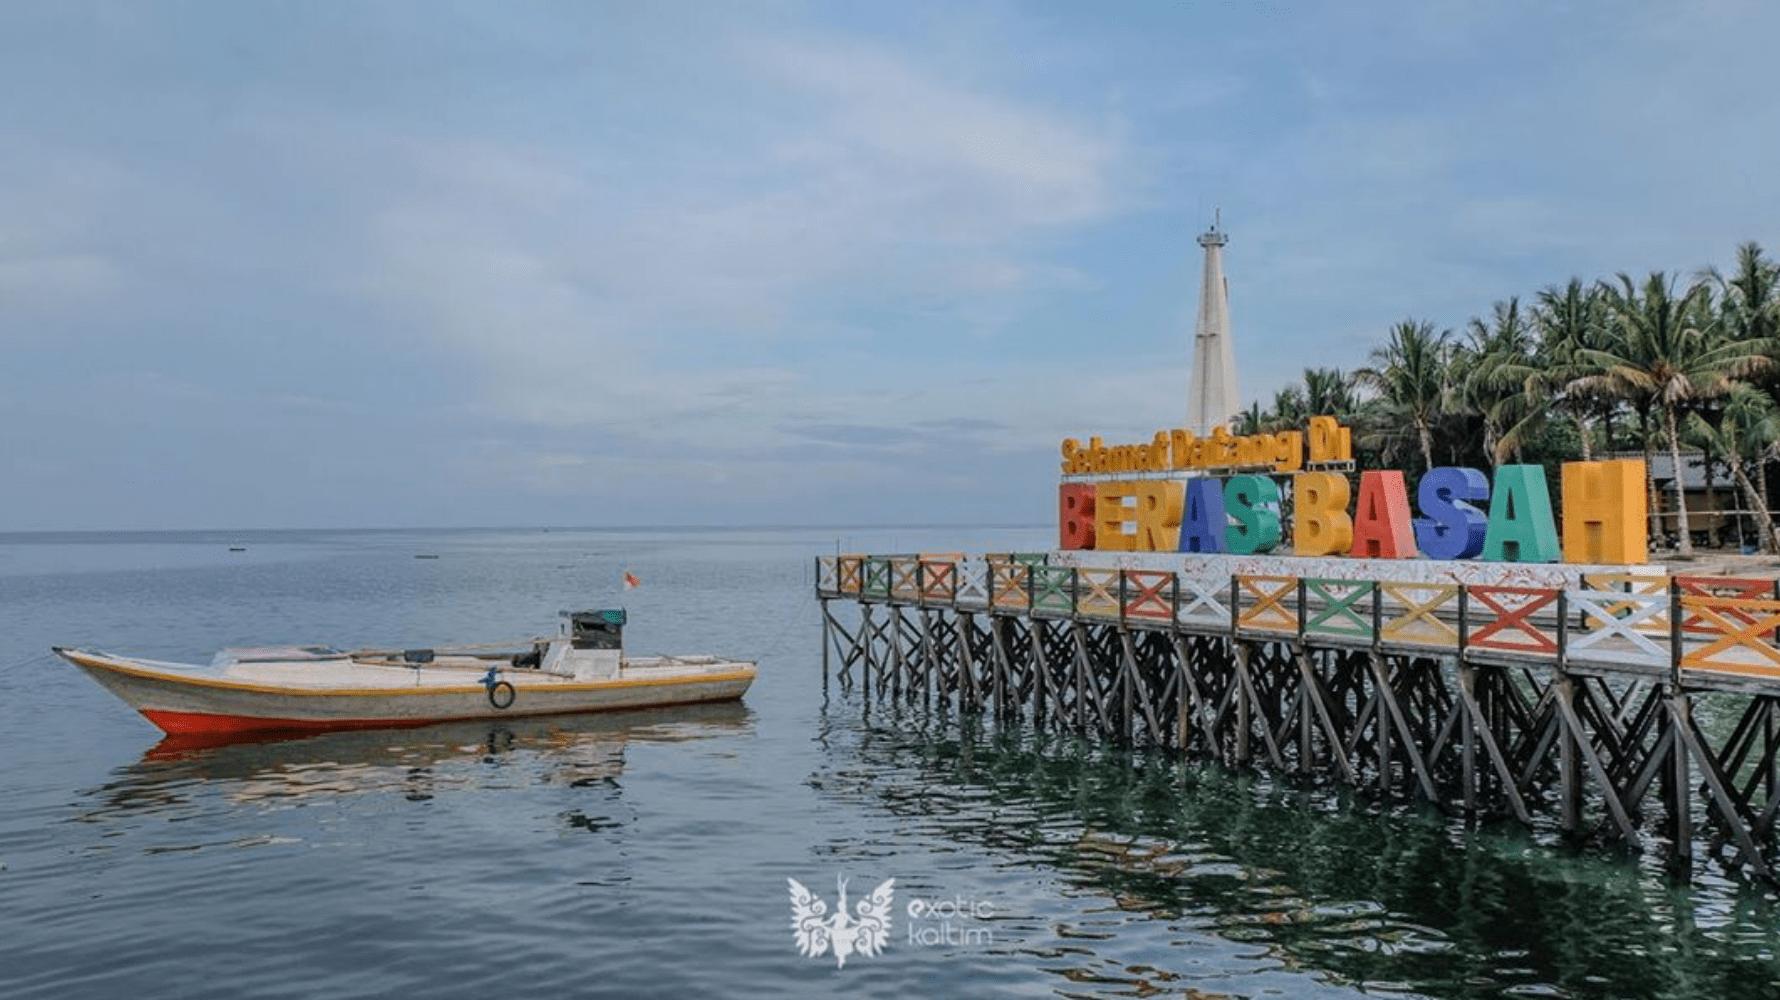 Tulisan Selamat datang di Pulau beras basah